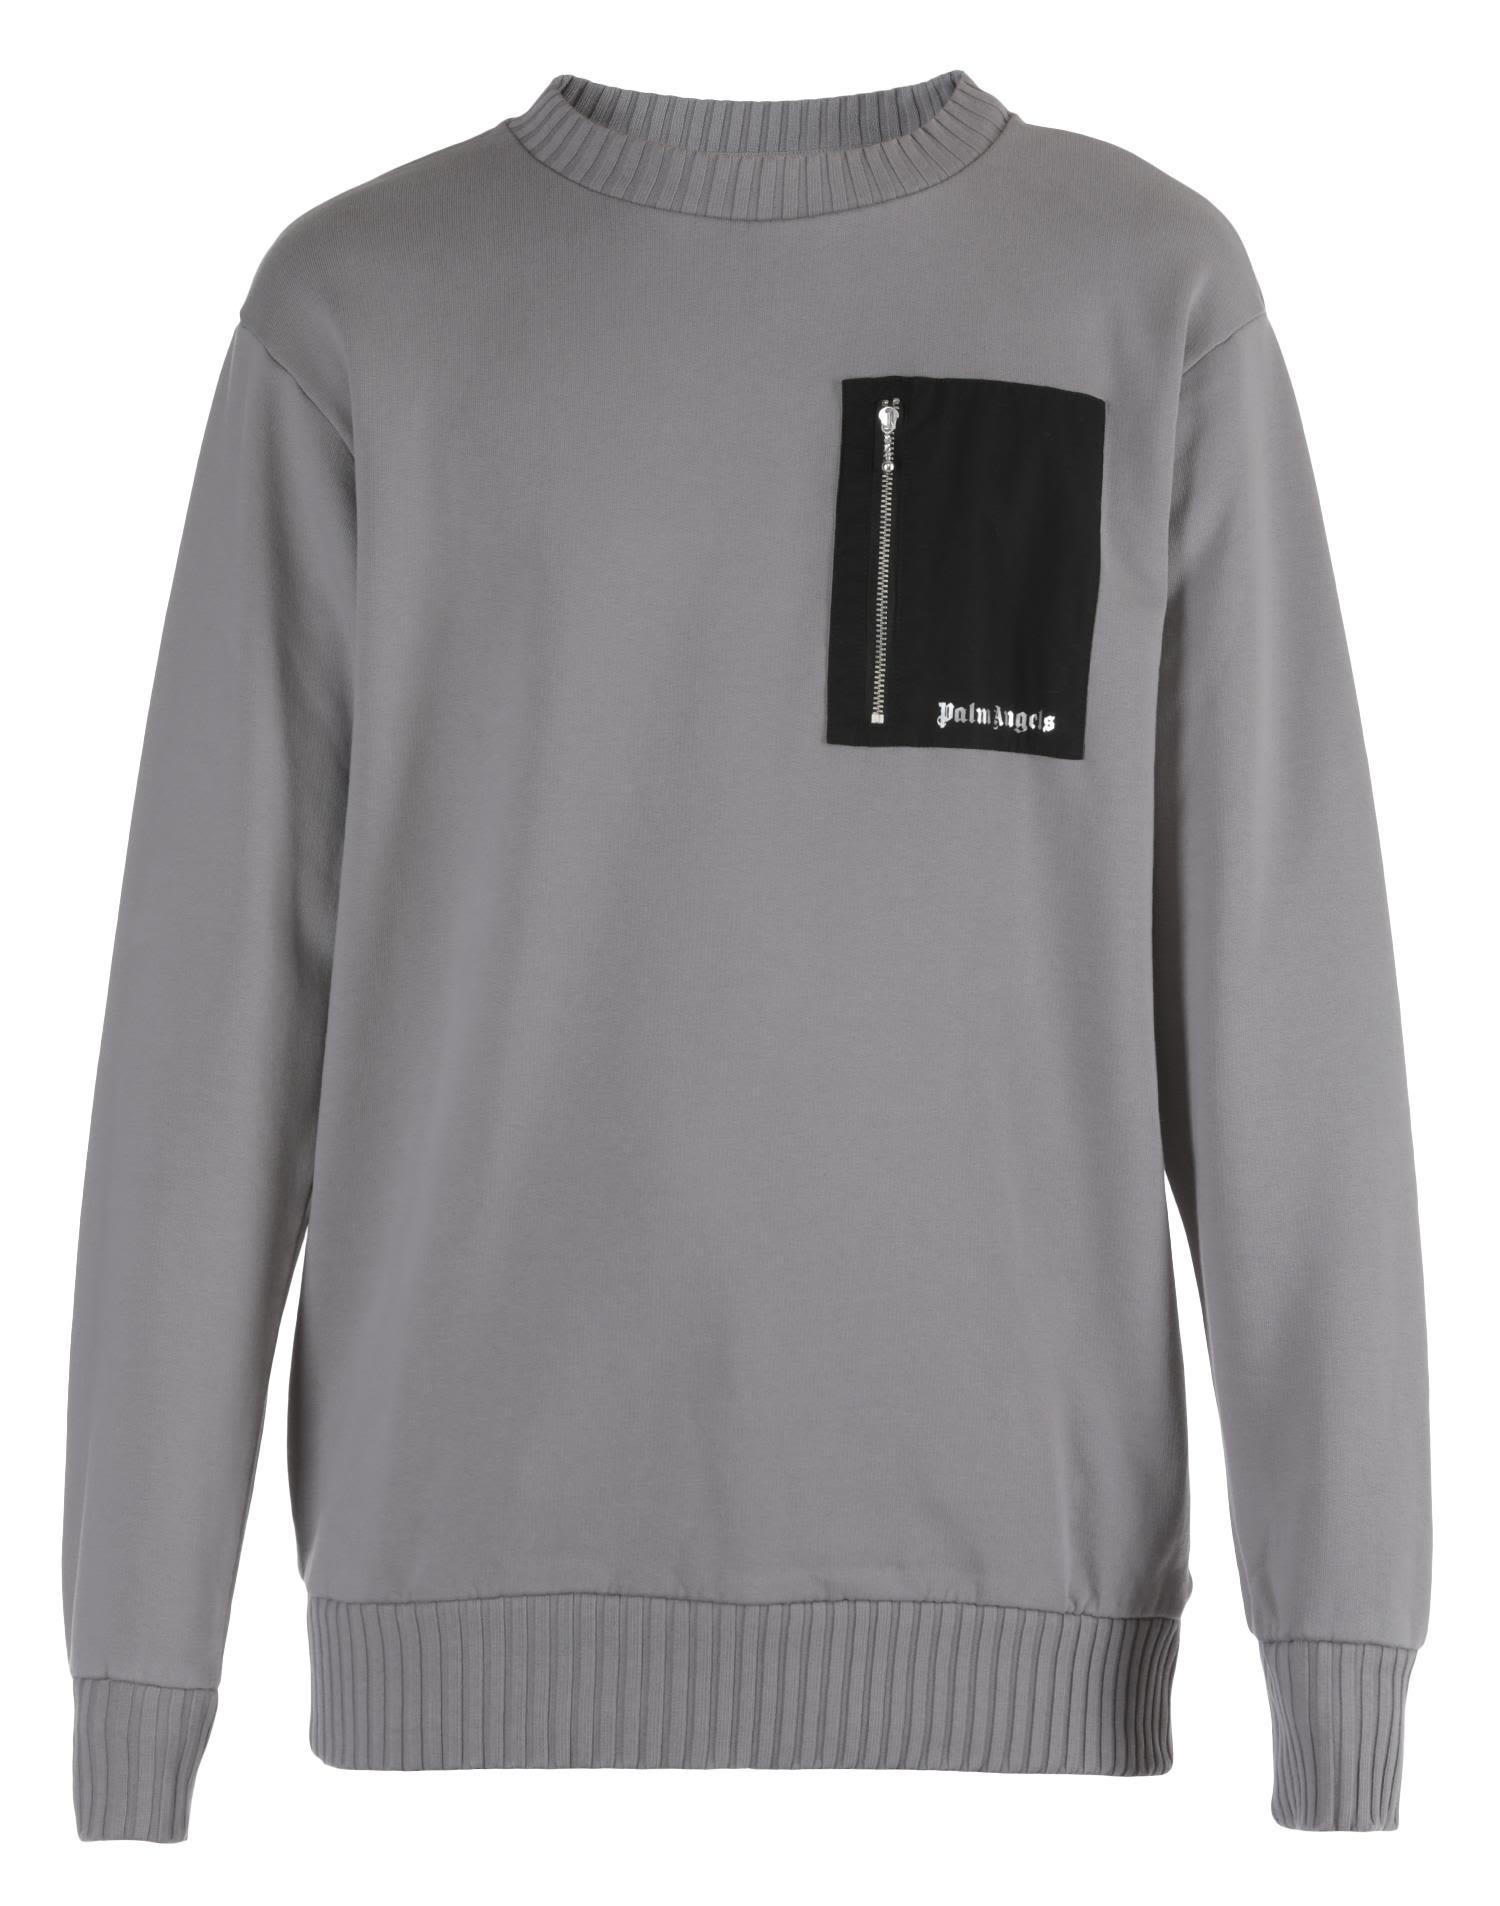 Palm Angels Cotton Sweatshirt